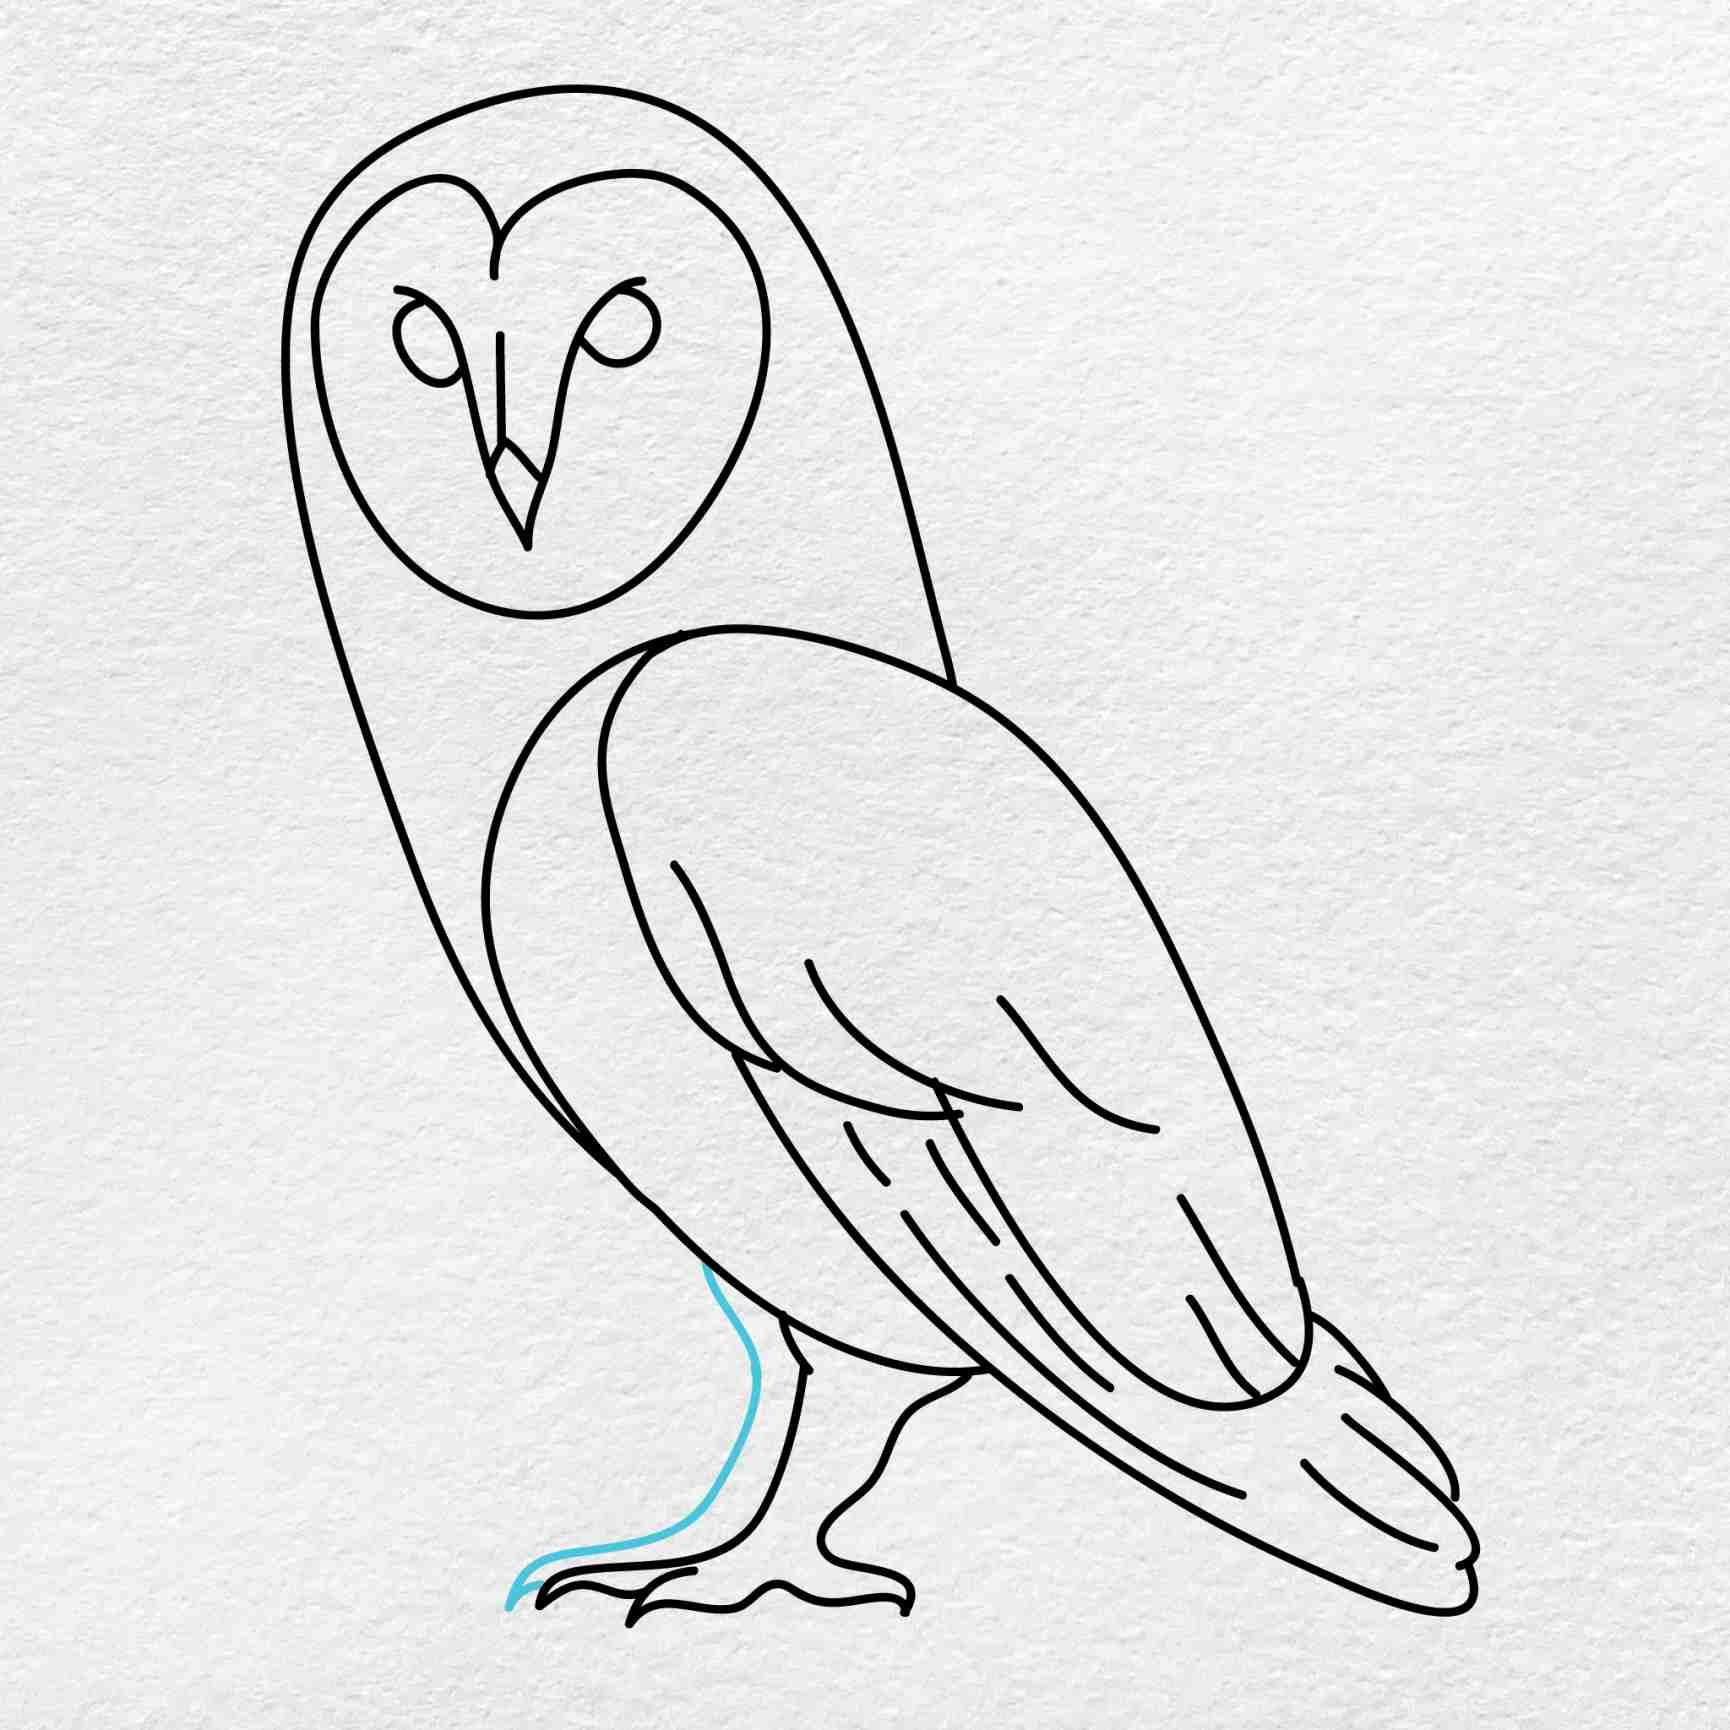 Barn Owl Drawing: Step 8